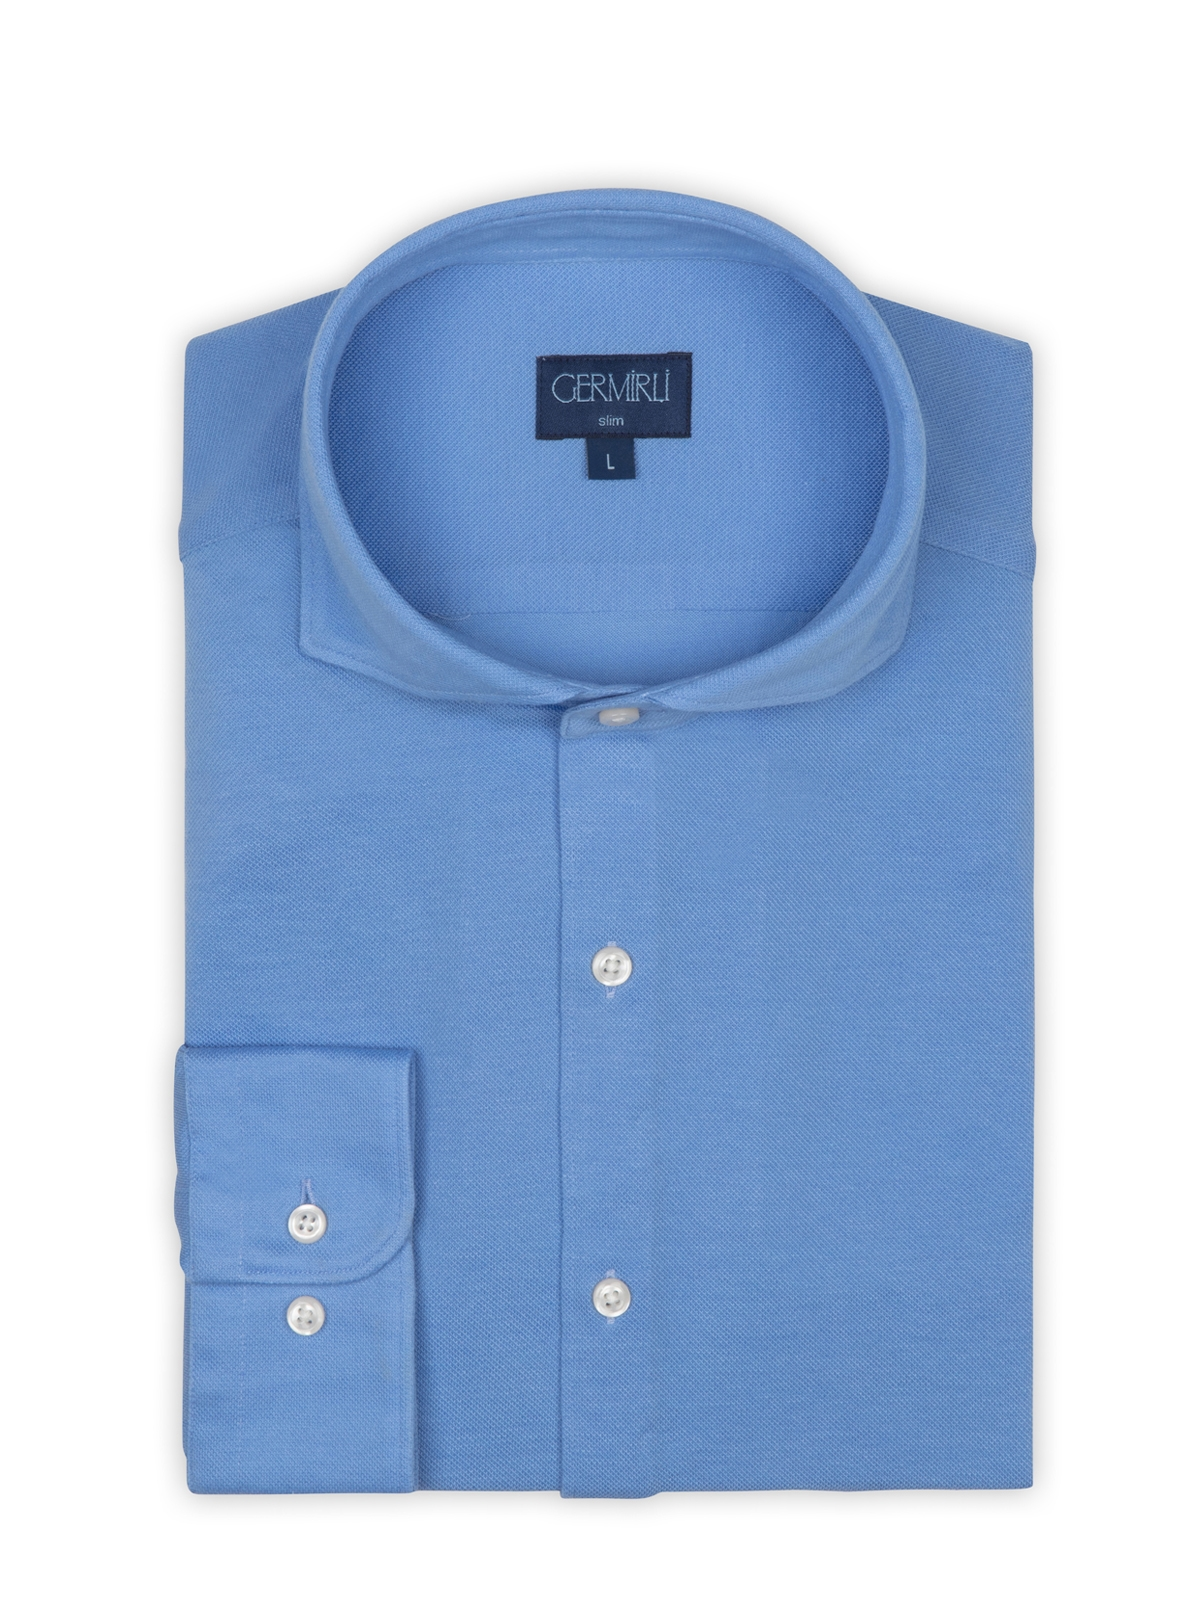 Germirli Mavi Italyan Yaka Örme Slim Fit Gömlek